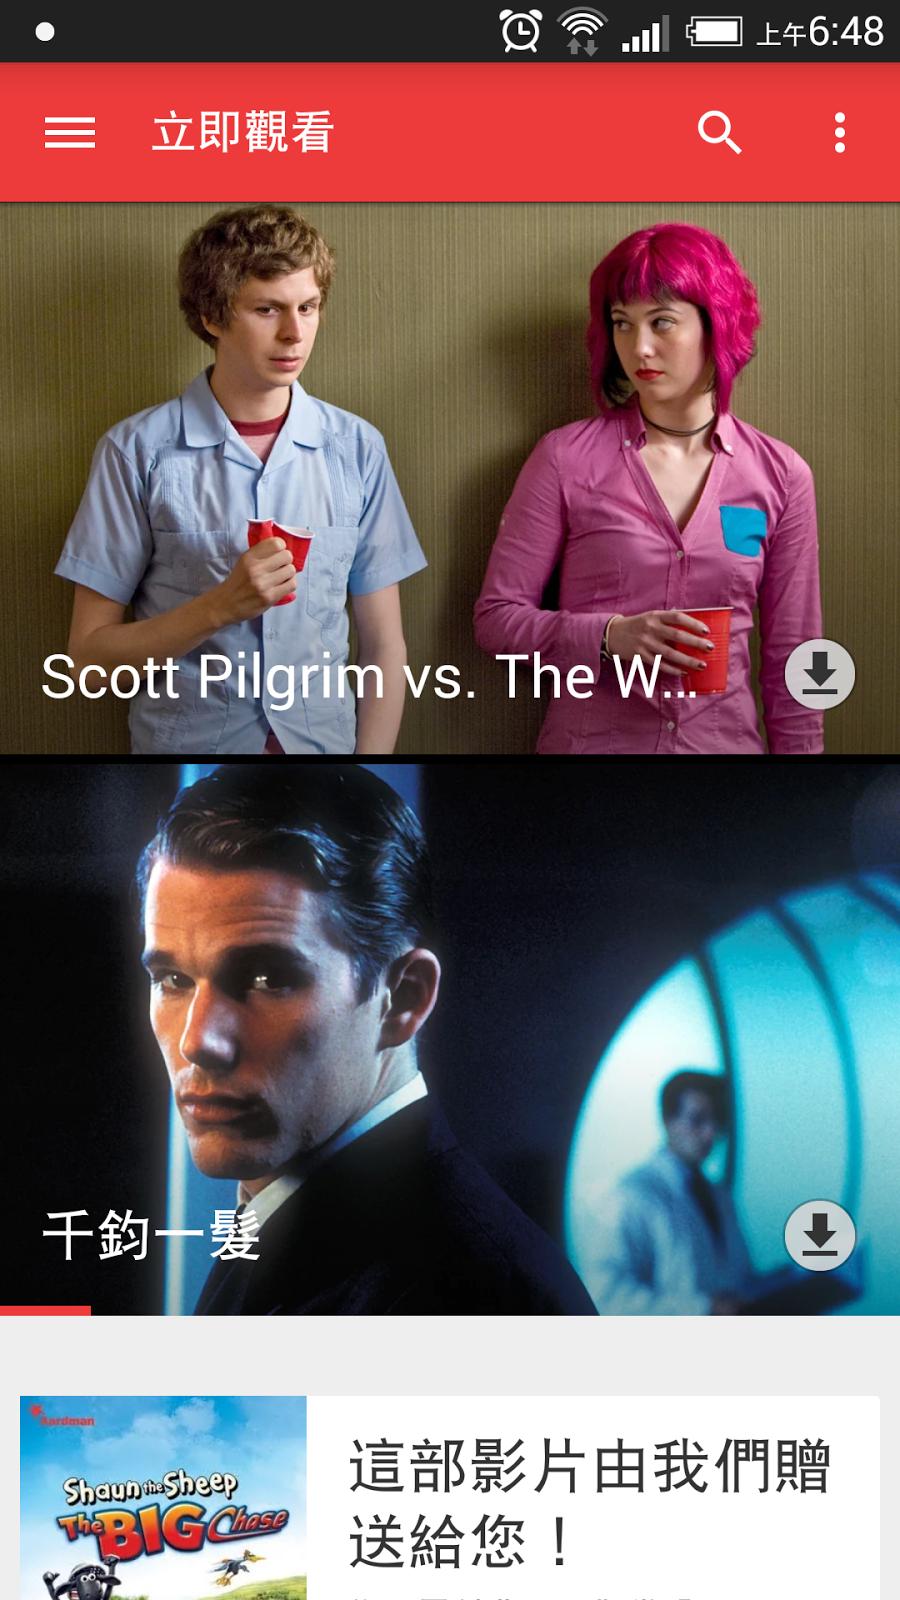 Google Play 電影臺灣推出!即時看片租片第一手心得